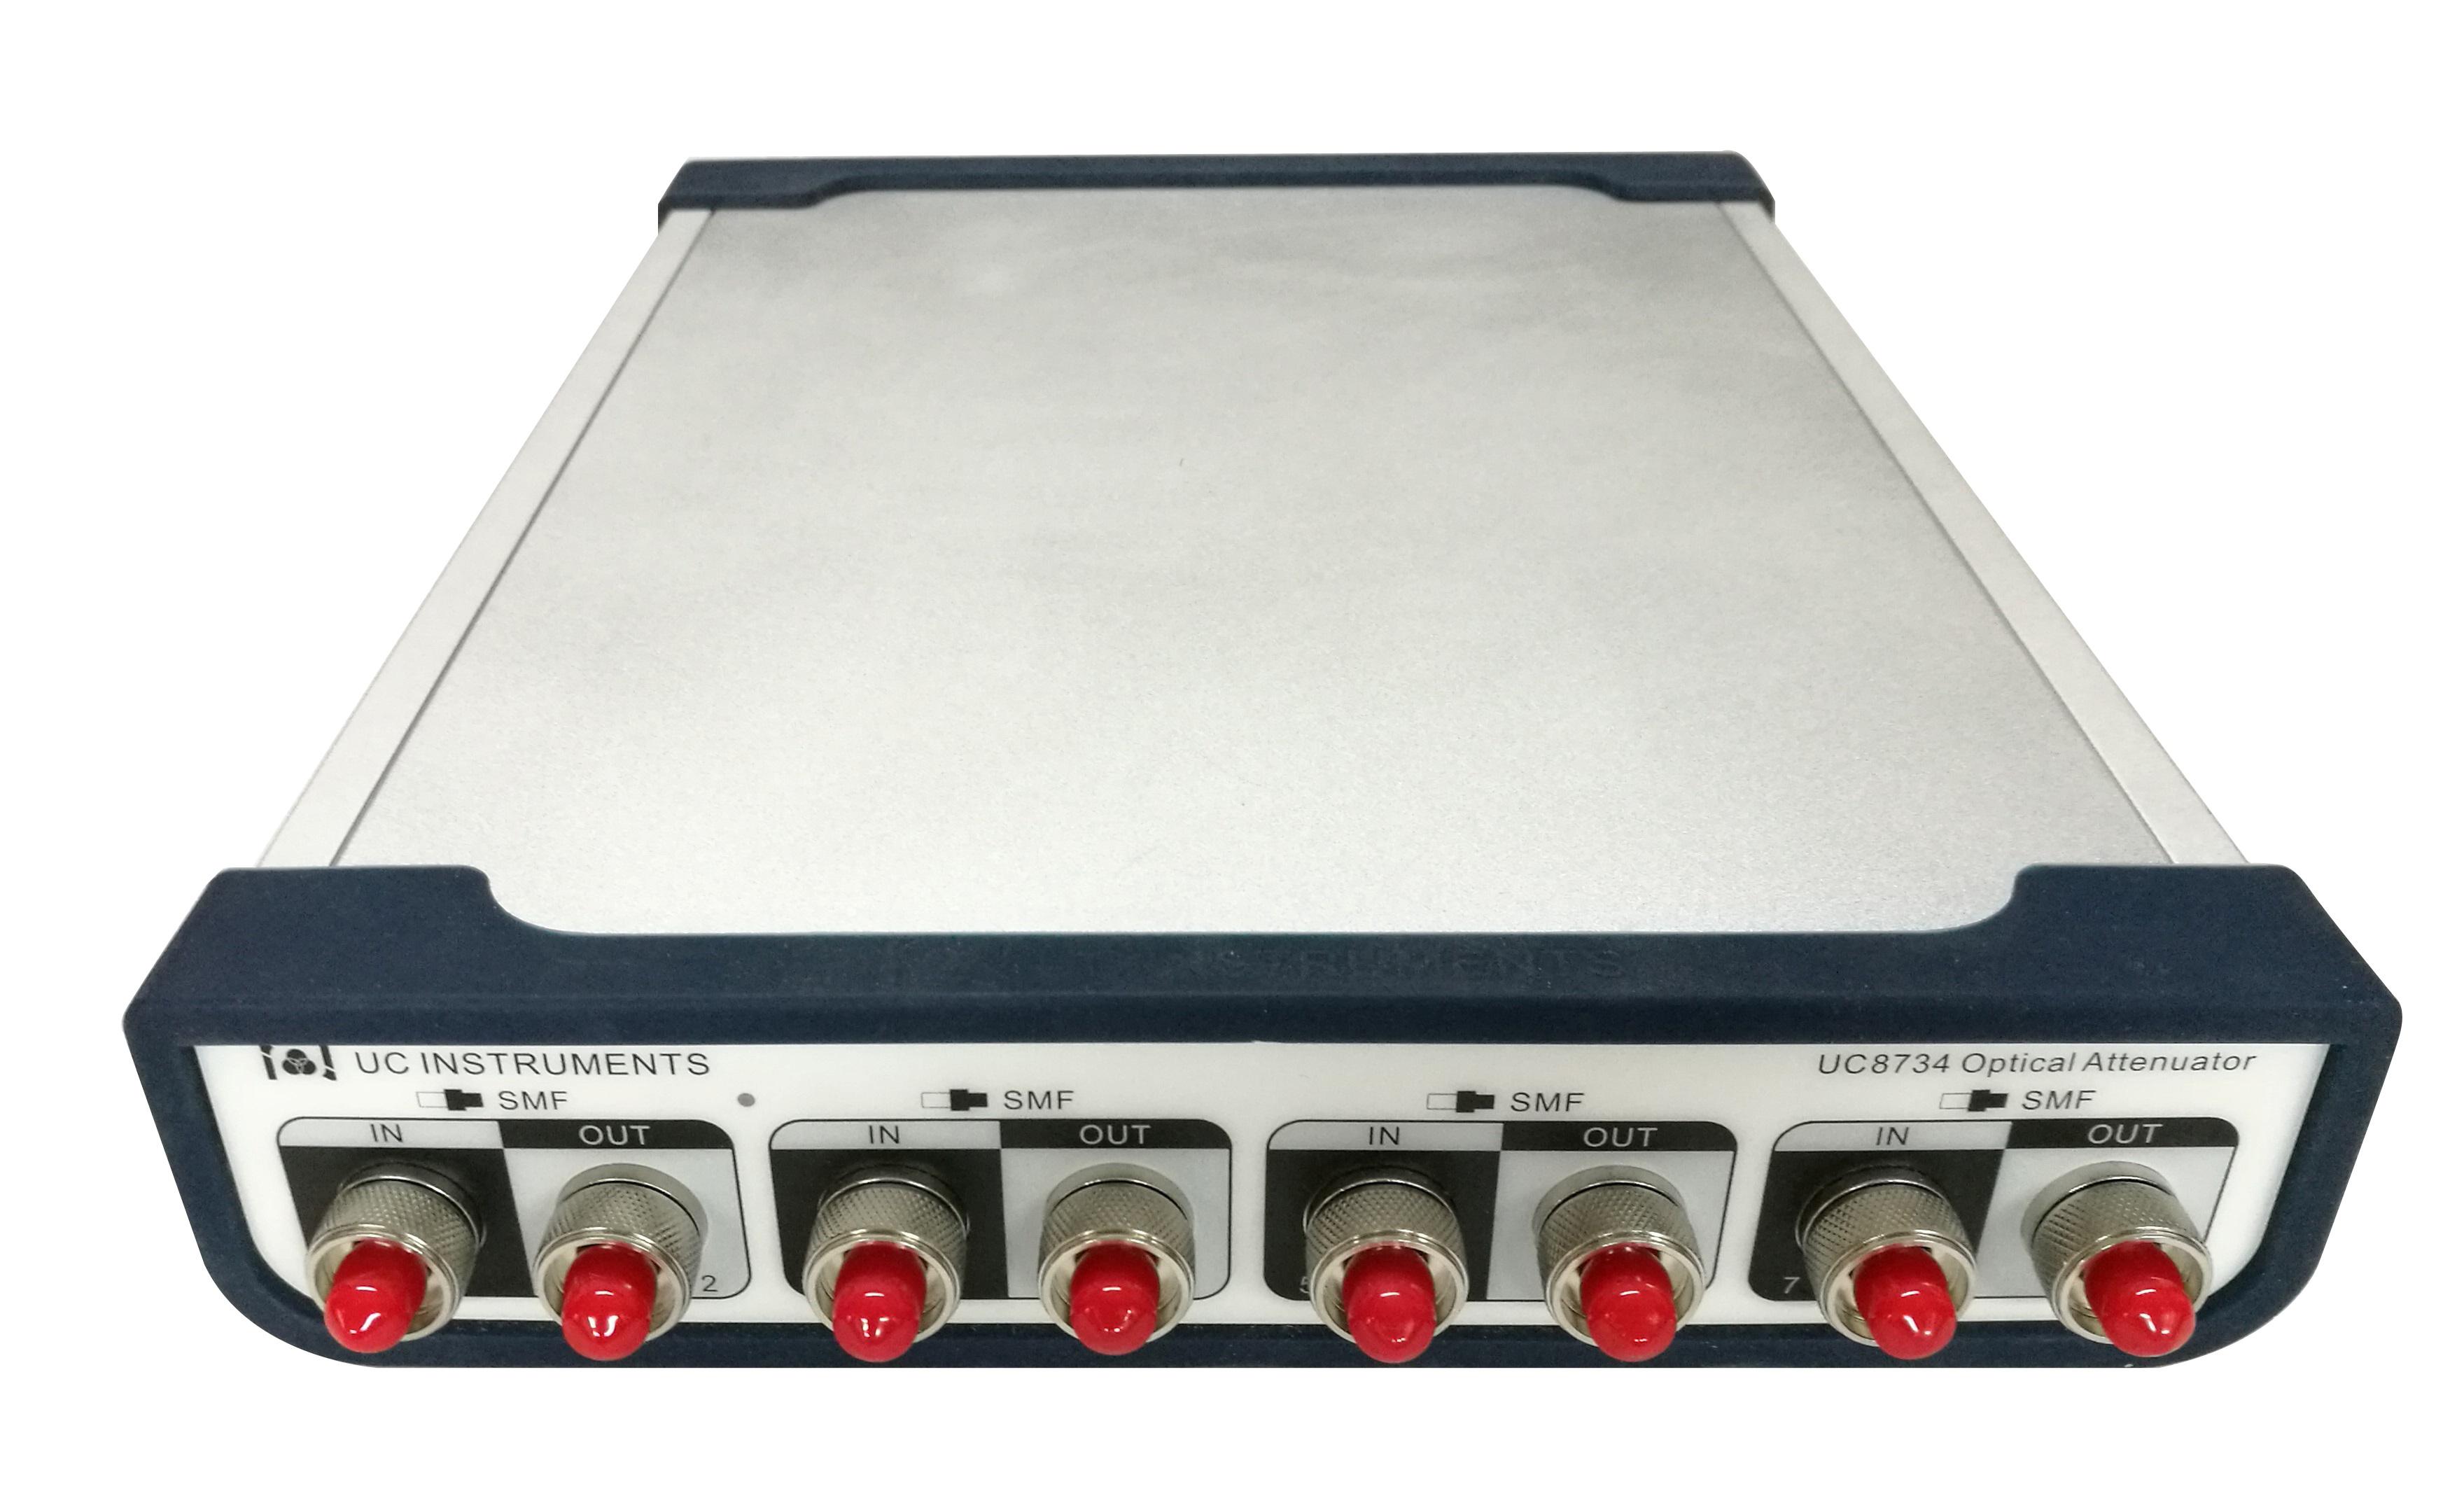 UC8744  4通道光控光衰减器